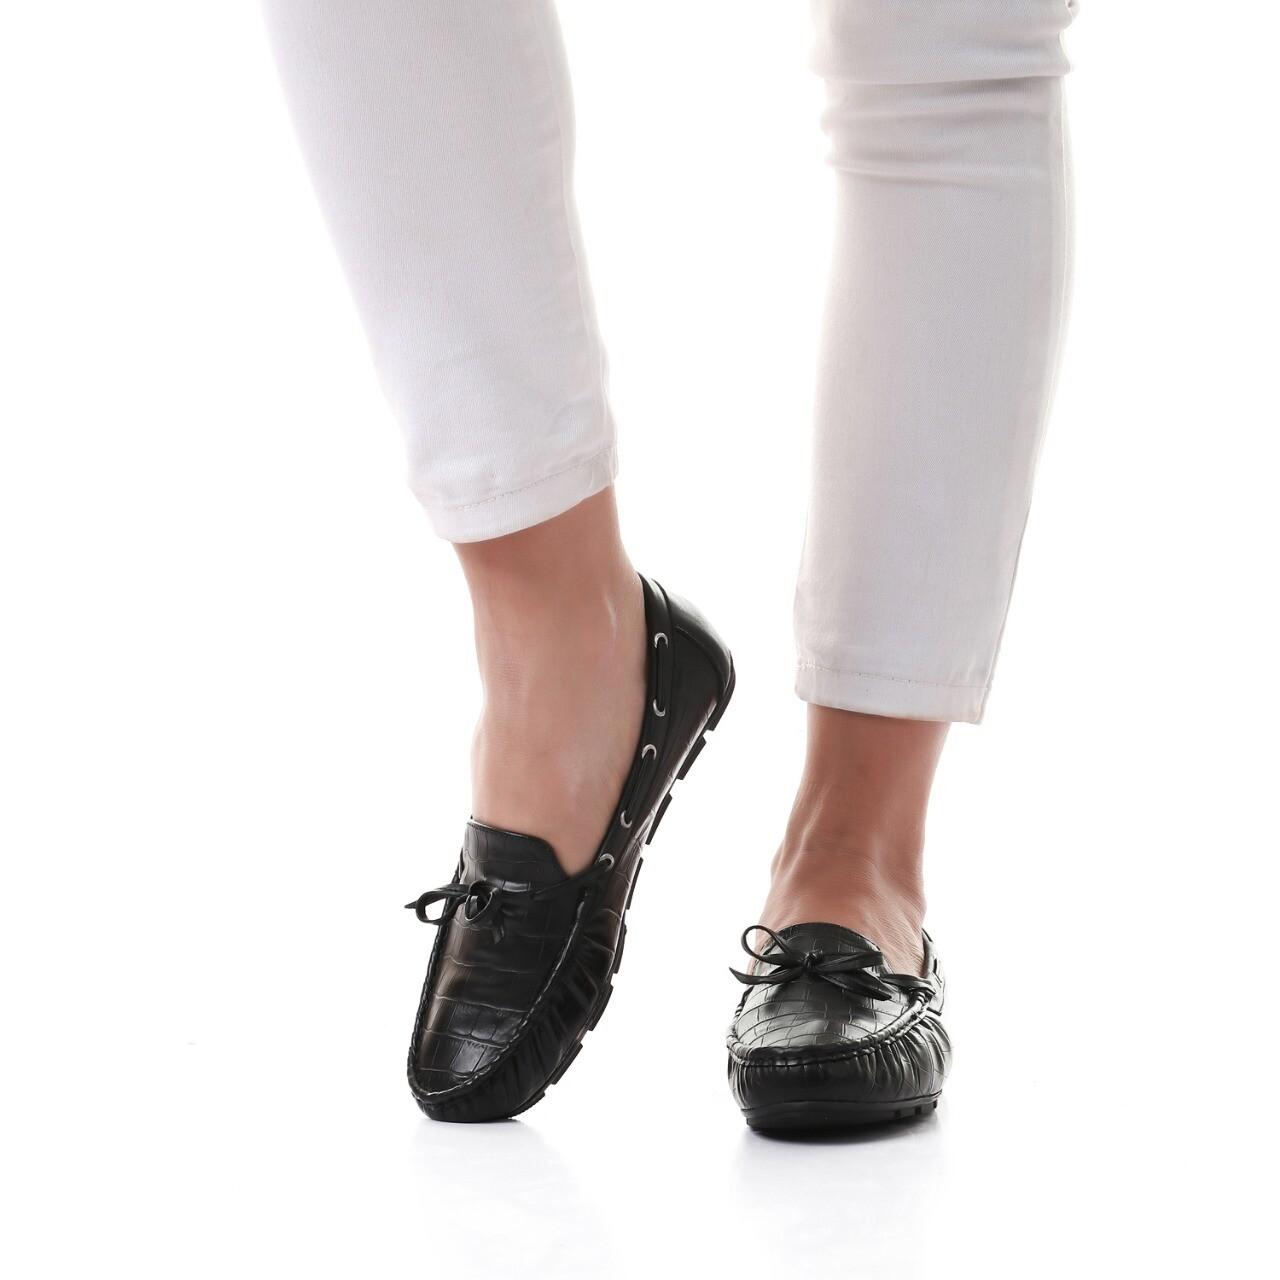 3457 Ballet Flat Shoes - black